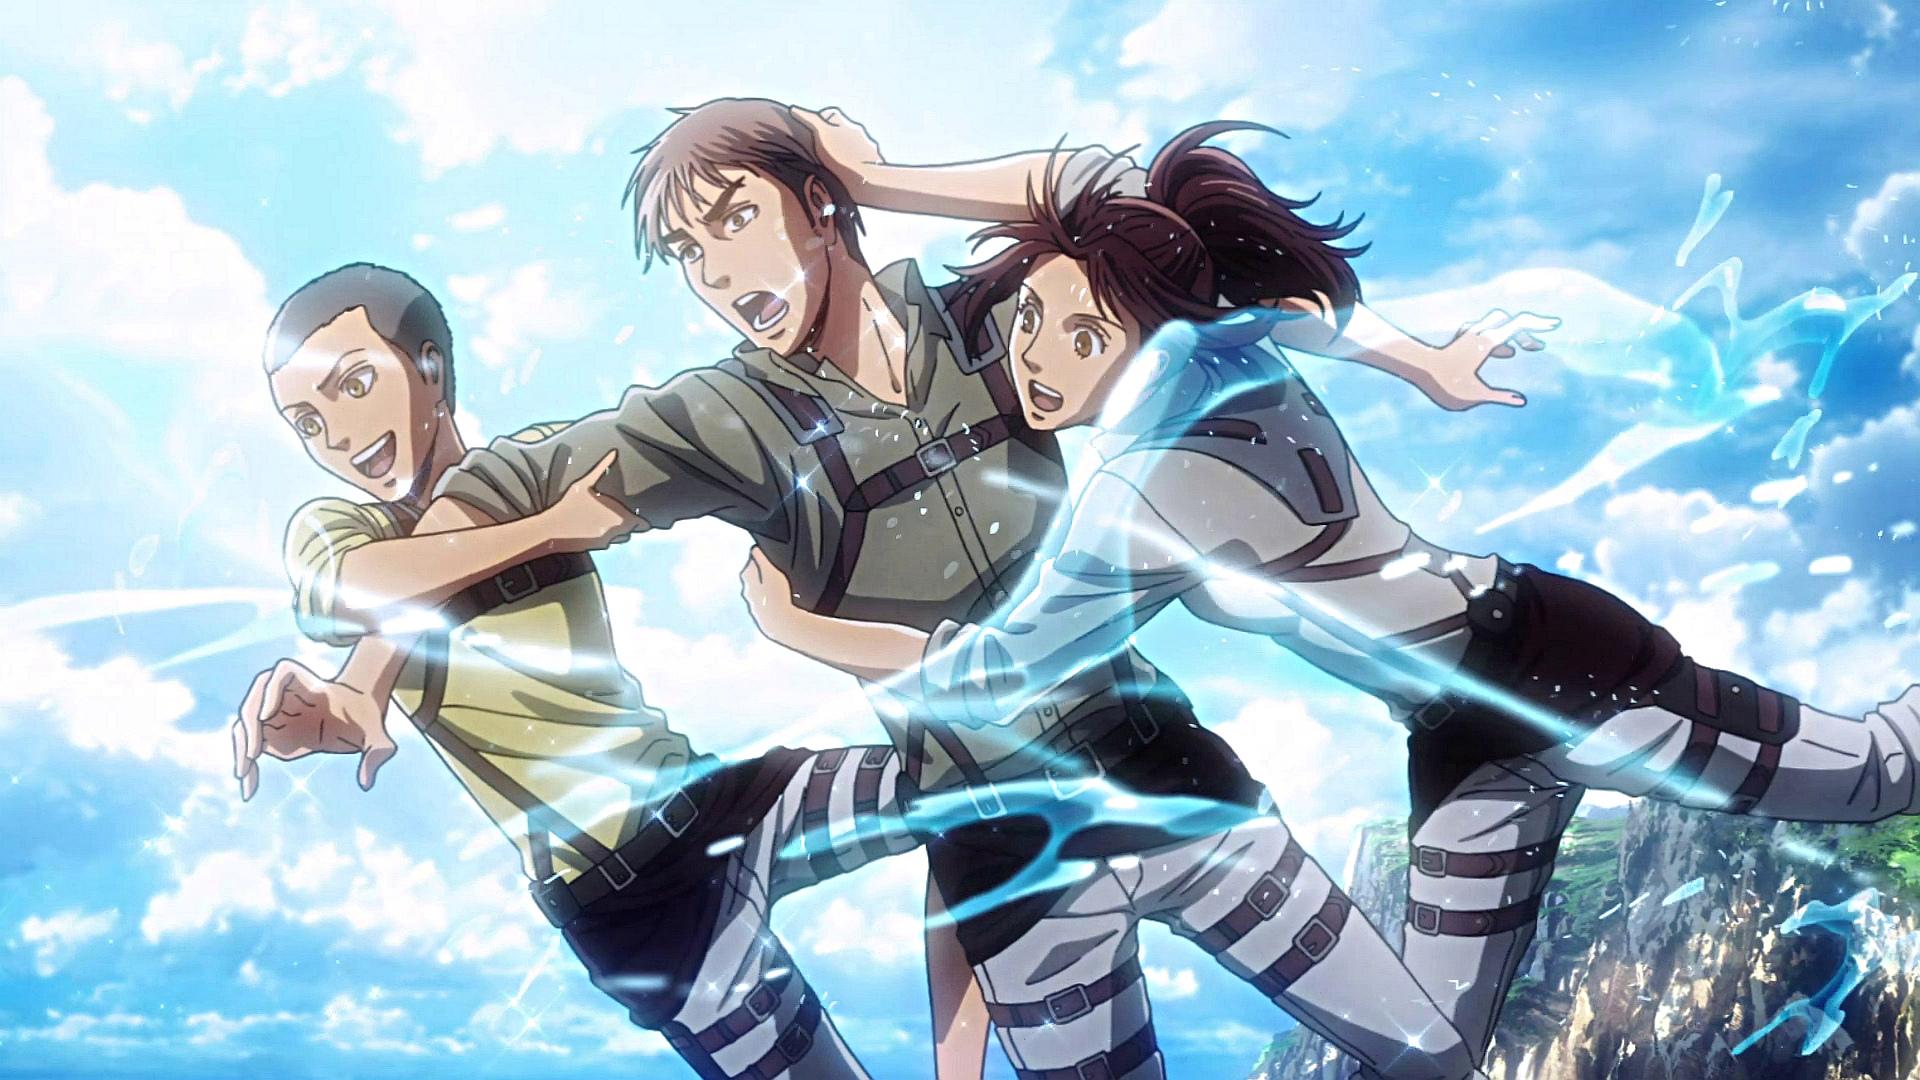 Conny Jean And Sasha Have Fun At The Sea In 2020 Attack On Titan Anime Attack On Titan Jean Attack On Titan Art